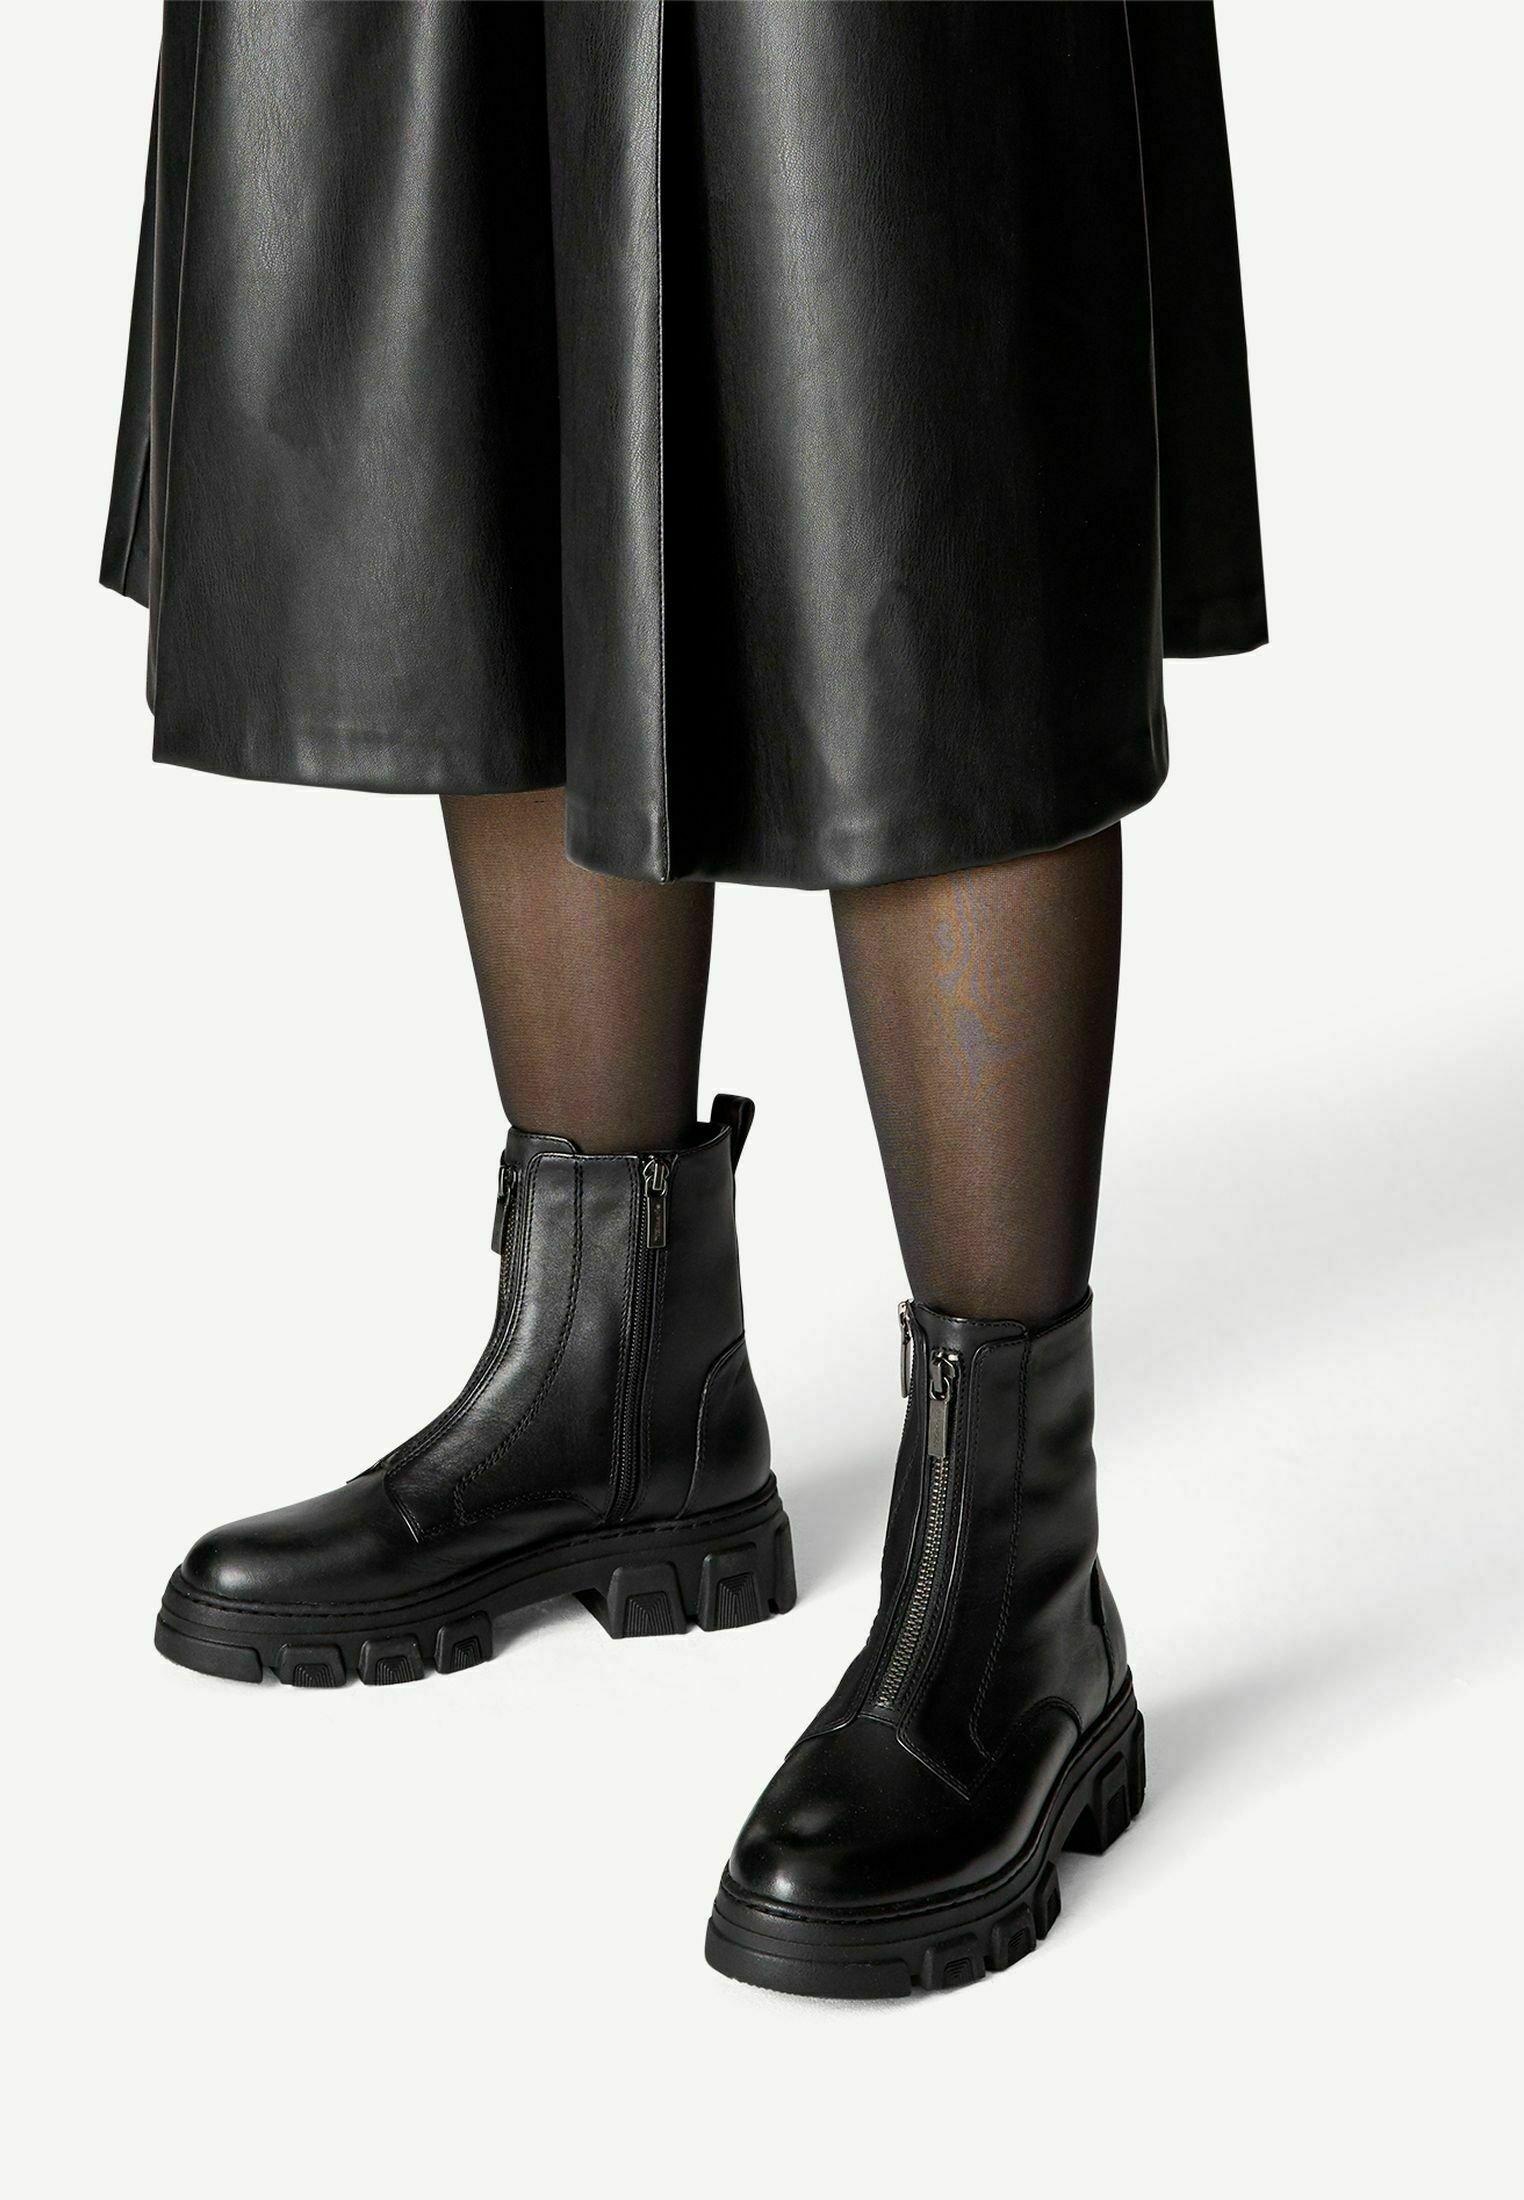 Damen Stiefelette